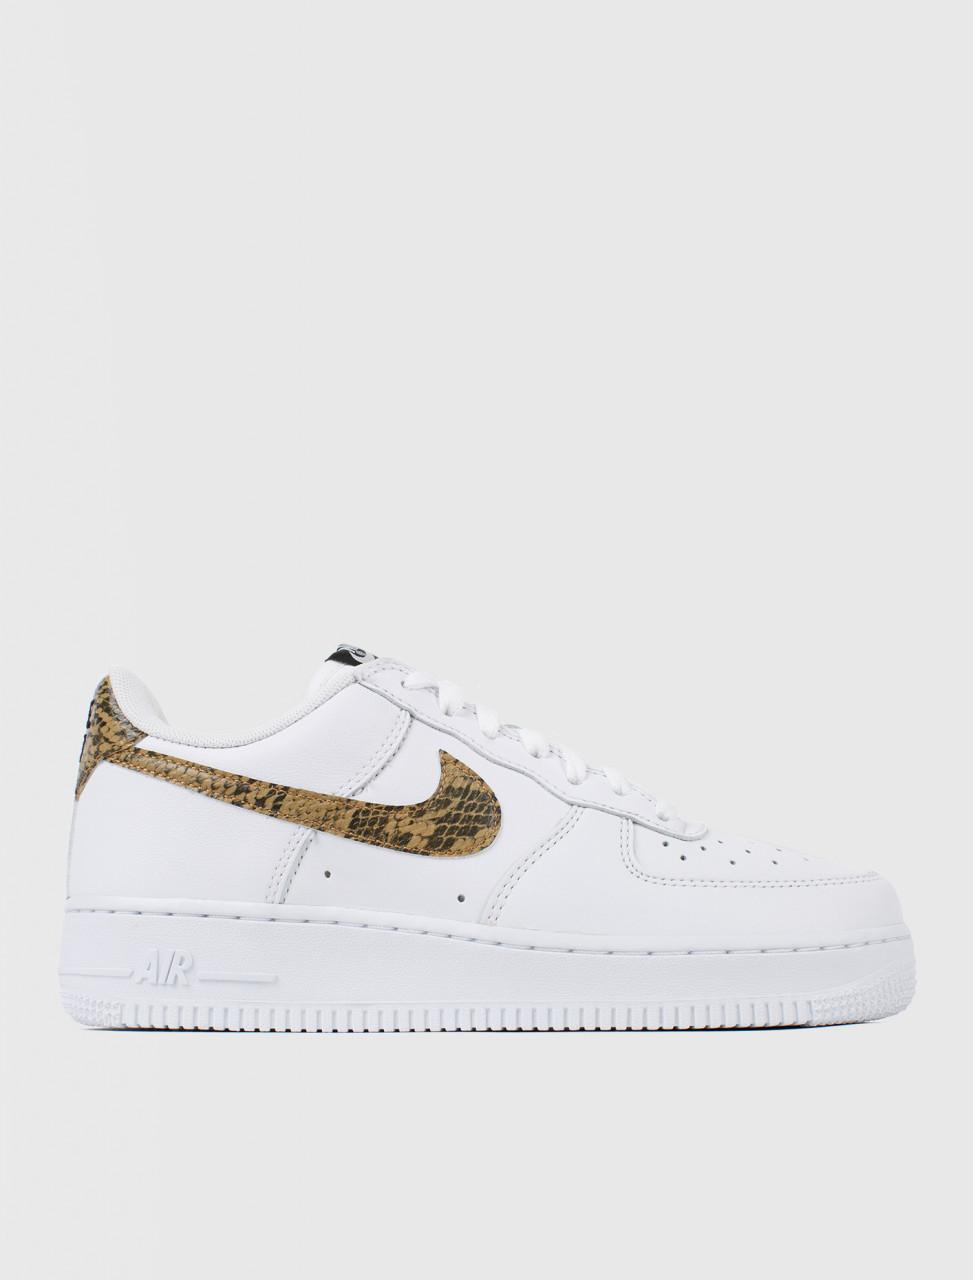 Air Force 1 Low Retro Premium QS Sneaker